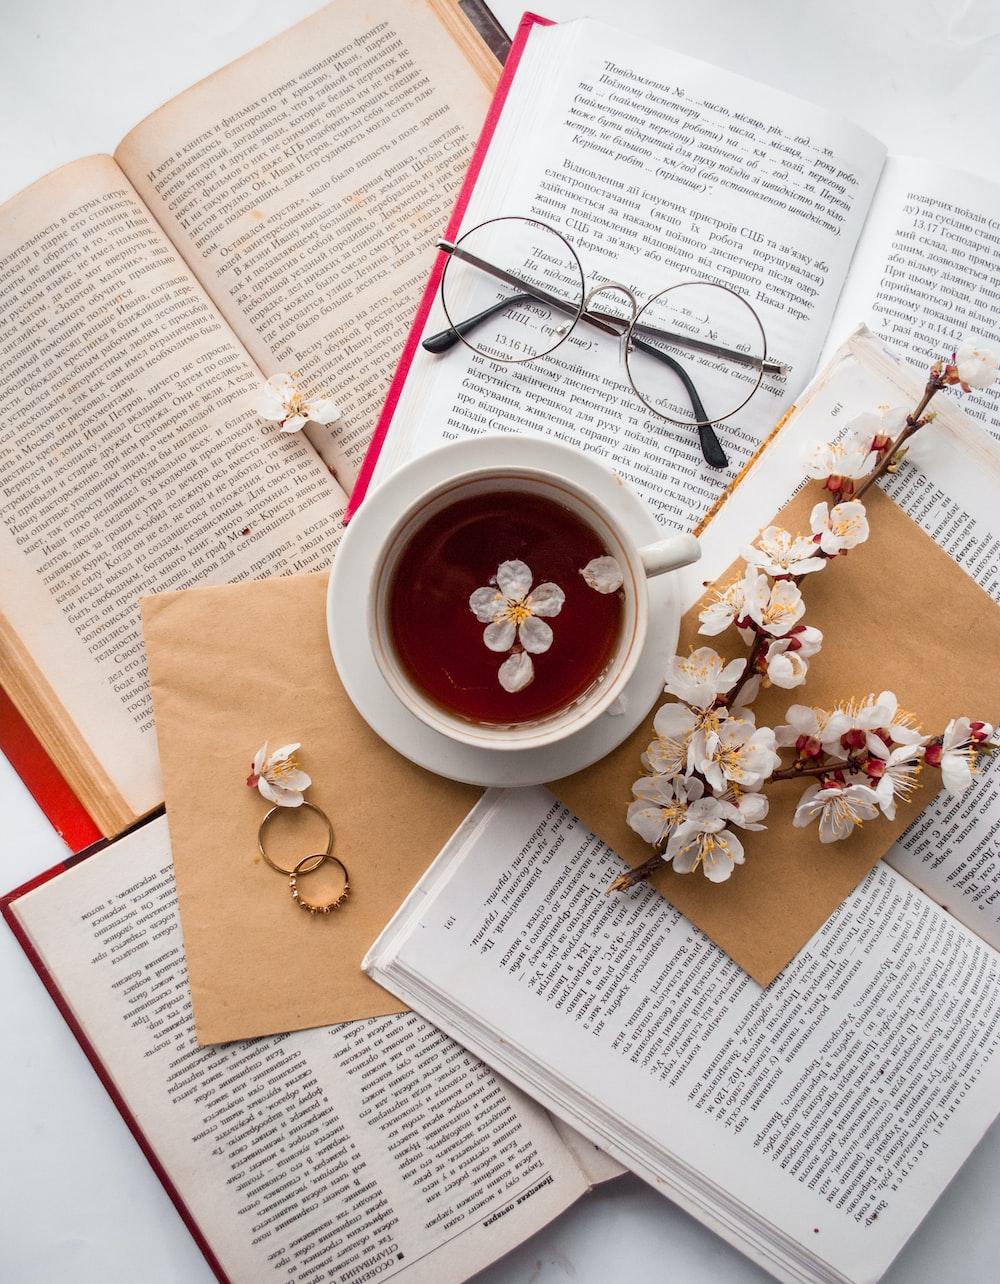 filled teacup on books